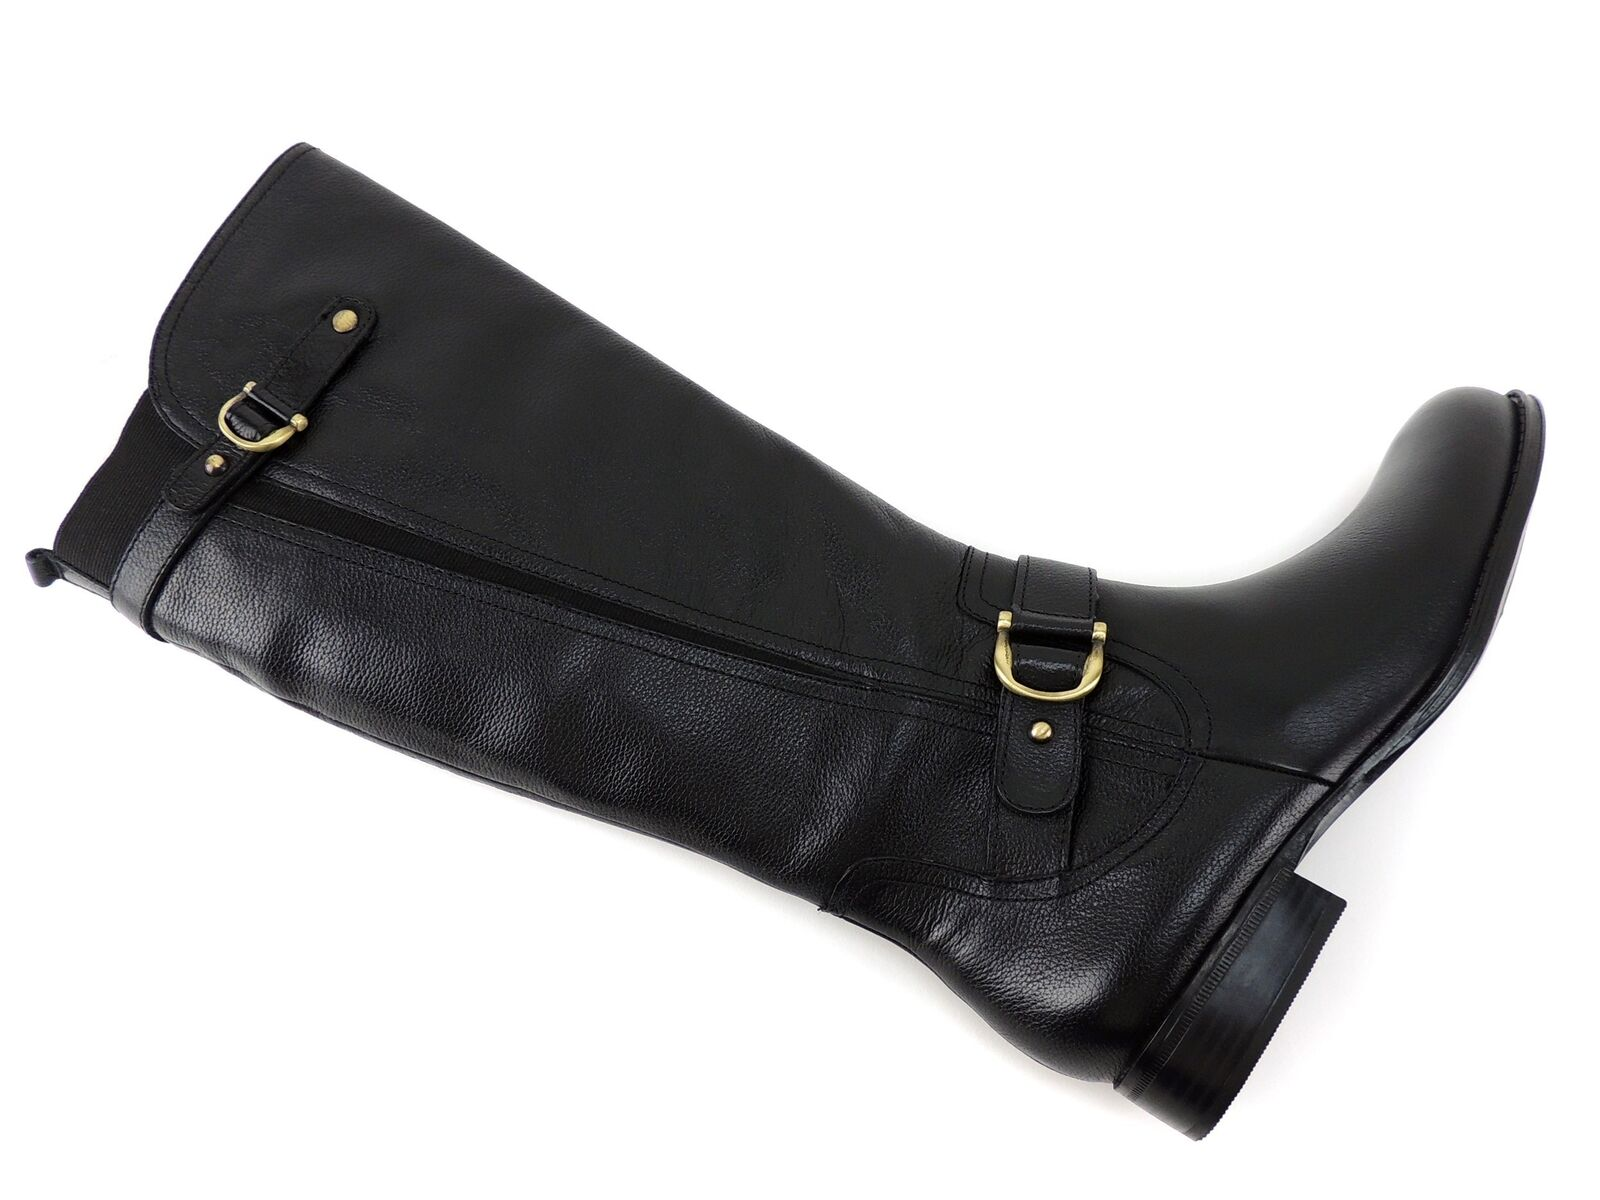 Naturalizer Jersey Mujer la rodilla rodilla rodilla botas altas de cuero negro Tamaño 9.5 M a1b98a